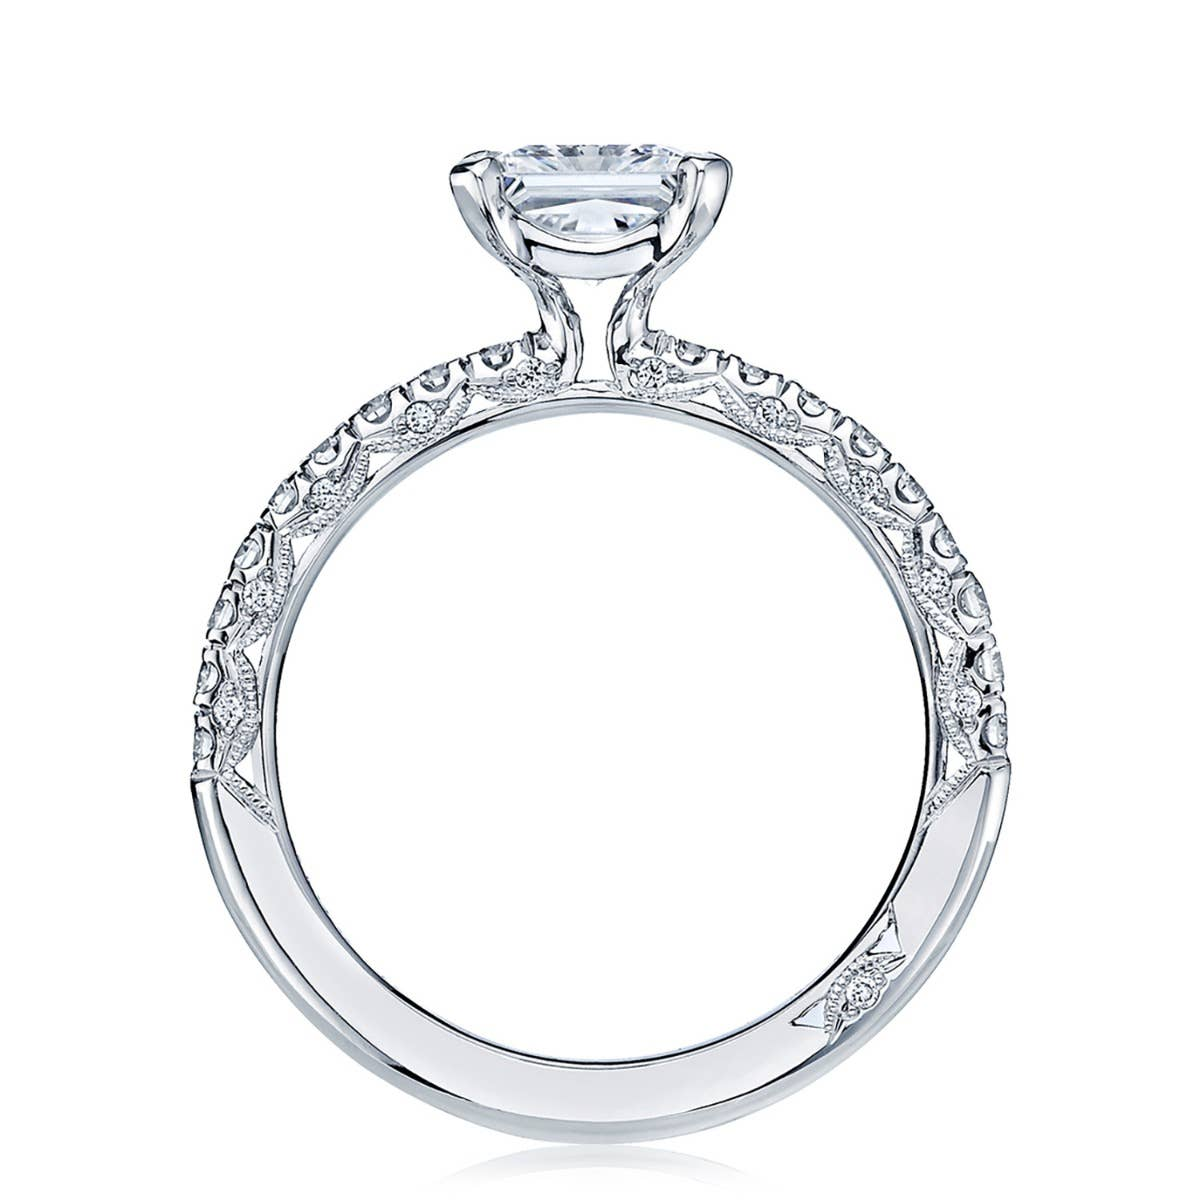 Tacori Engagement Rings - ht2545pr